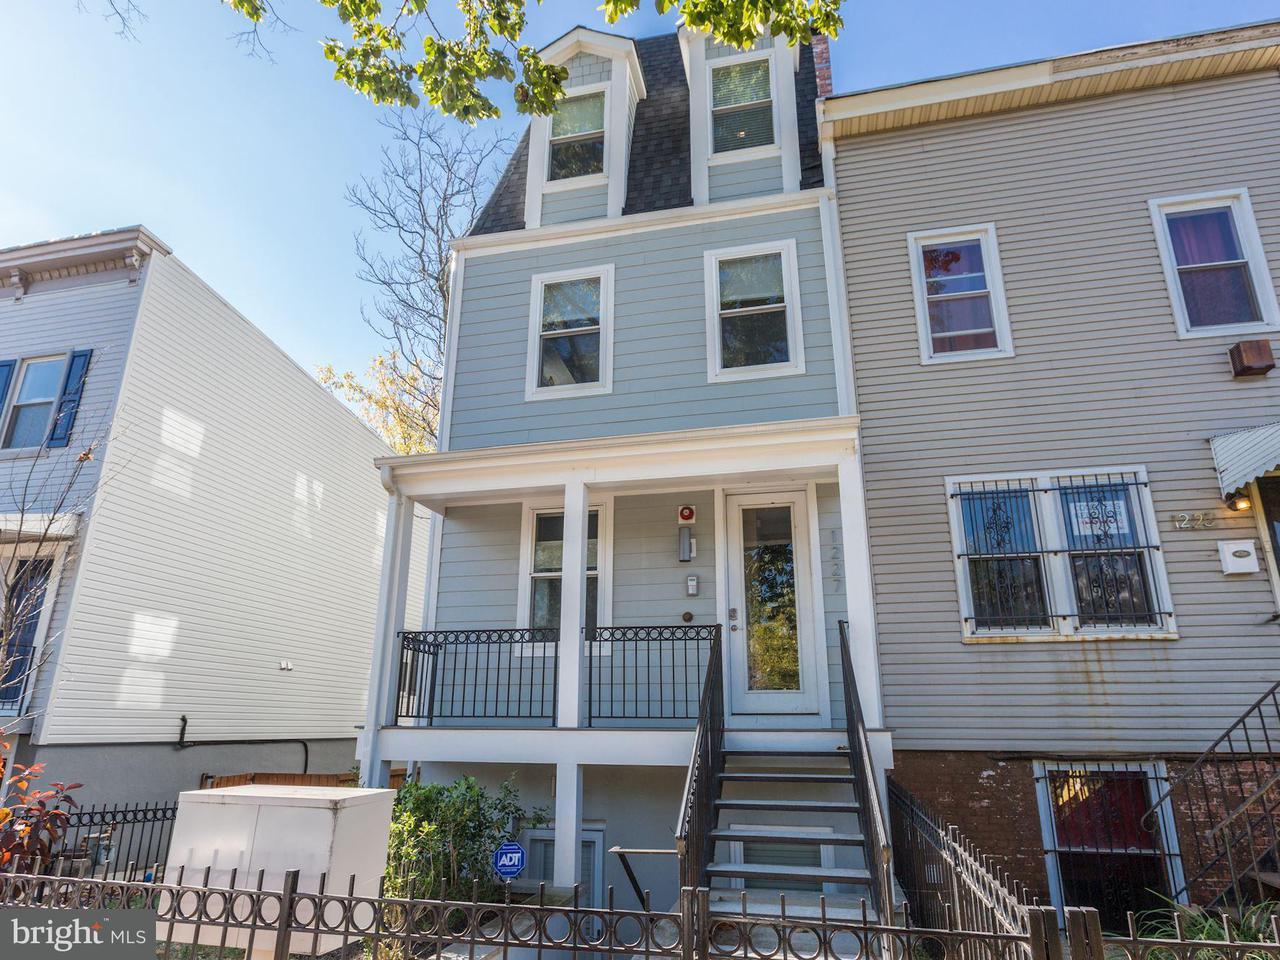 Townhouse for Sale at 1227 MORSE ST NE #4 1227 MORSE ST NE #4 Washington, District Of Columbia 20002 United States